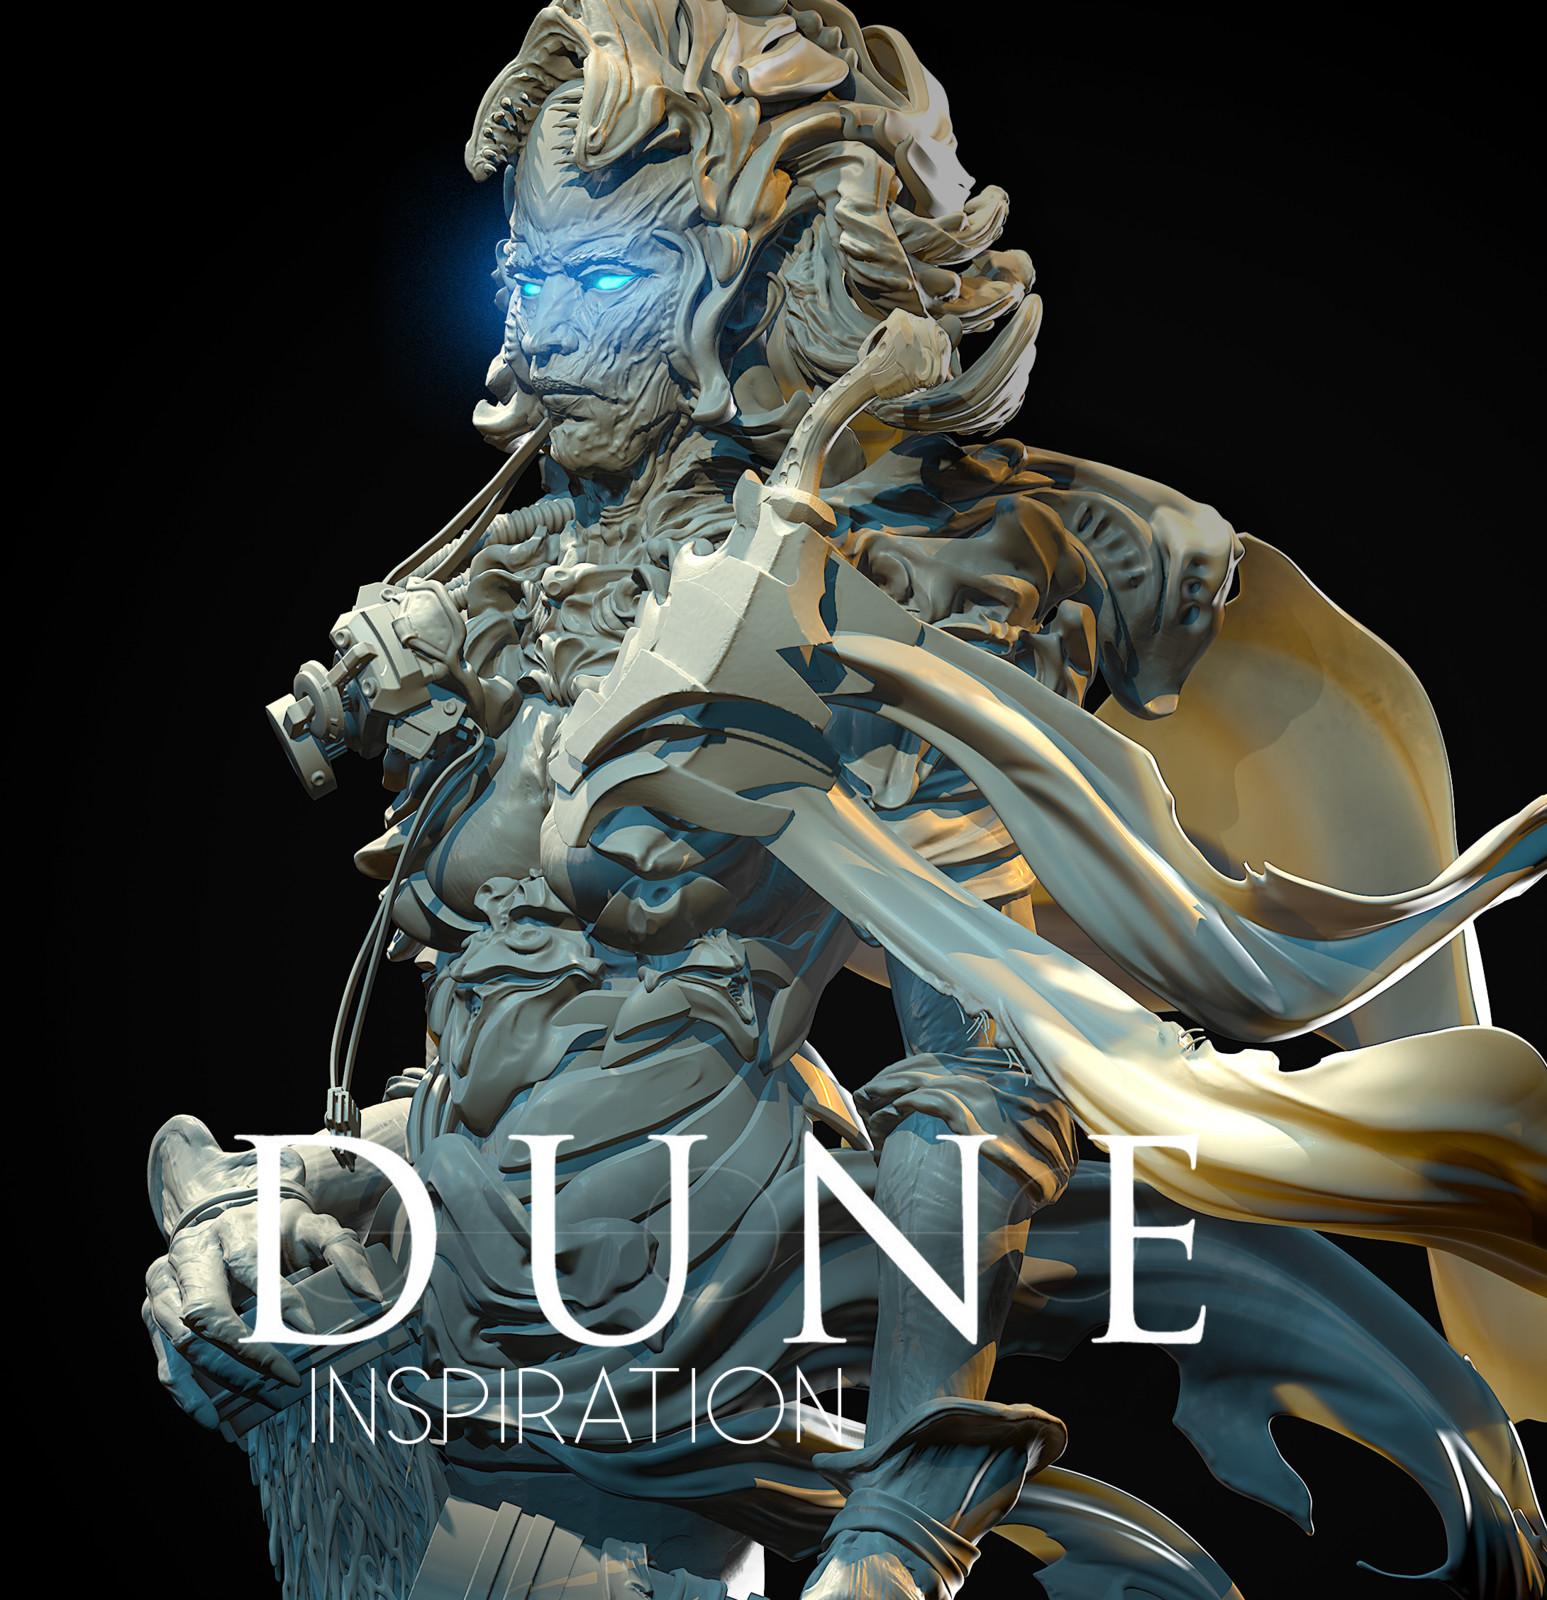 DUNE_Inspiration Judgement on Arakis